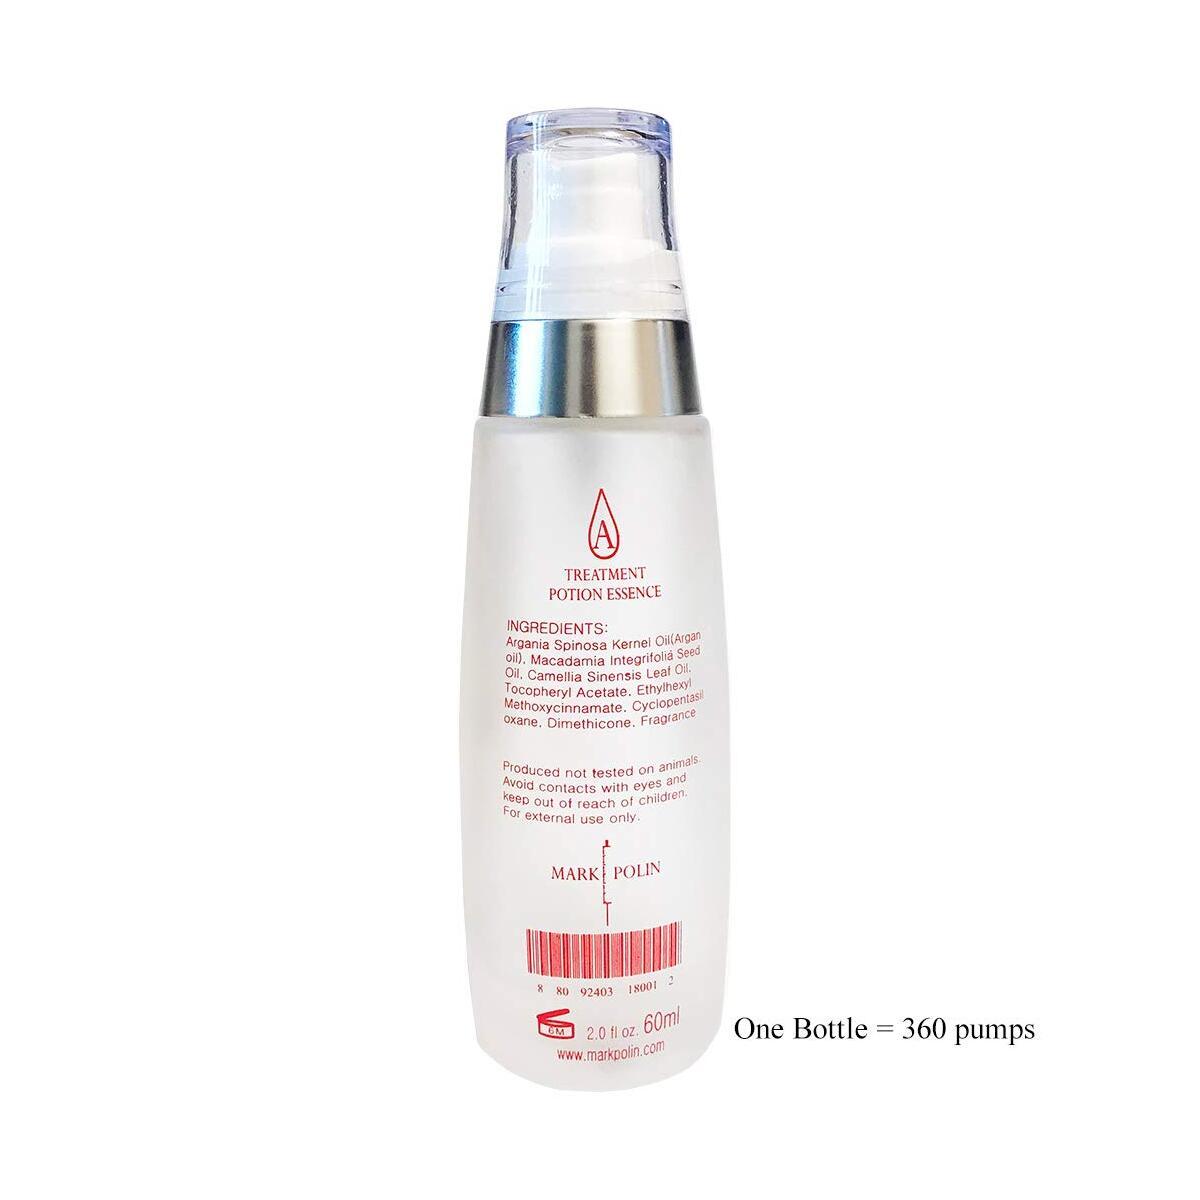 Keratin Hair Treatment Oil - Anti-frizz Gloss, Weightless treatment softens & repairs dry damaged hair, Moroccan Argan Oils Natural plant Protein Treatment for hair